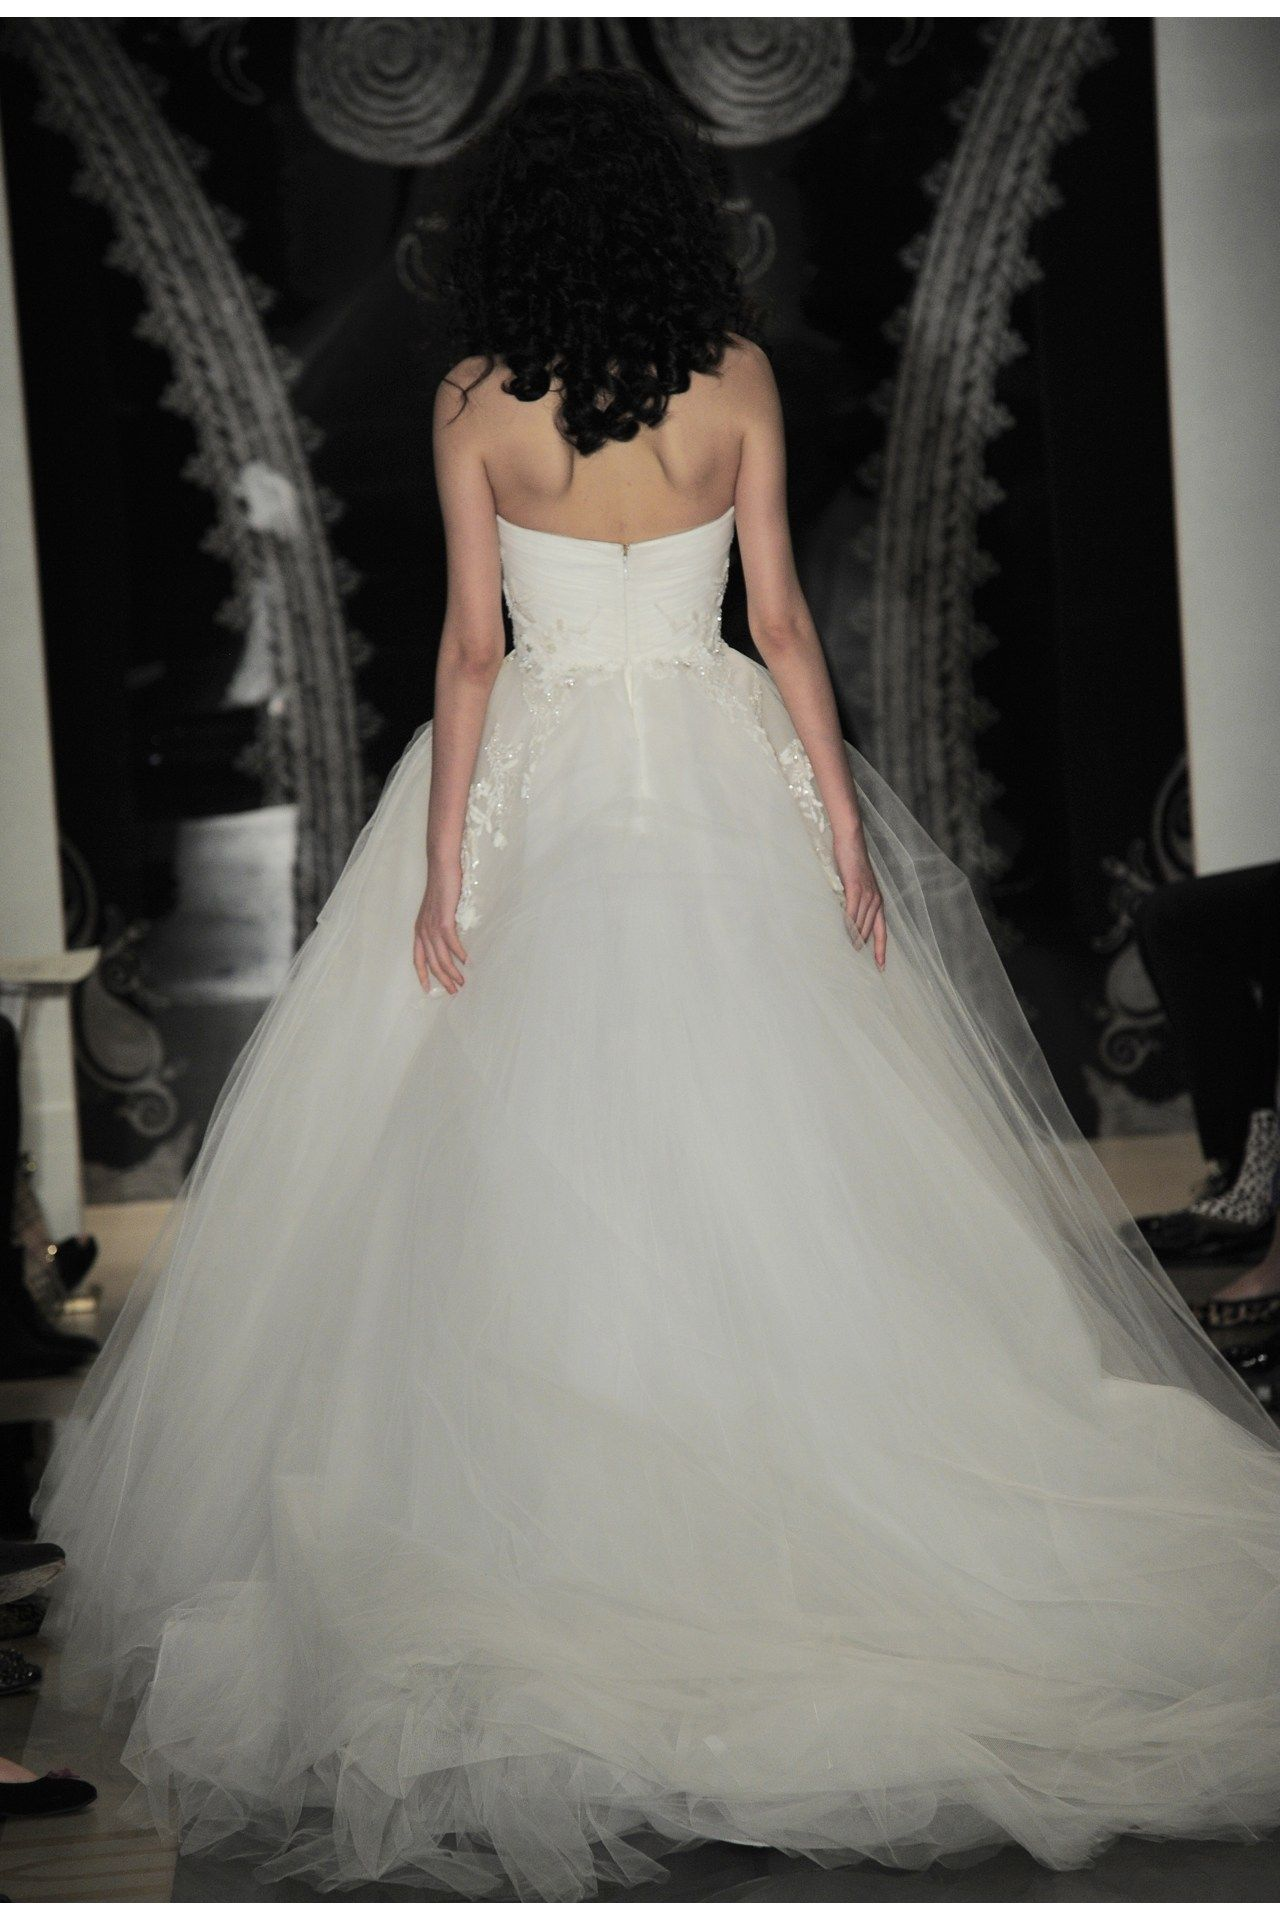 Reem Acra - Bridal Spring 2014  TAGS:Floor-length, Strapless, Ivory, Reem Acra, Silk, Tulle, Princess